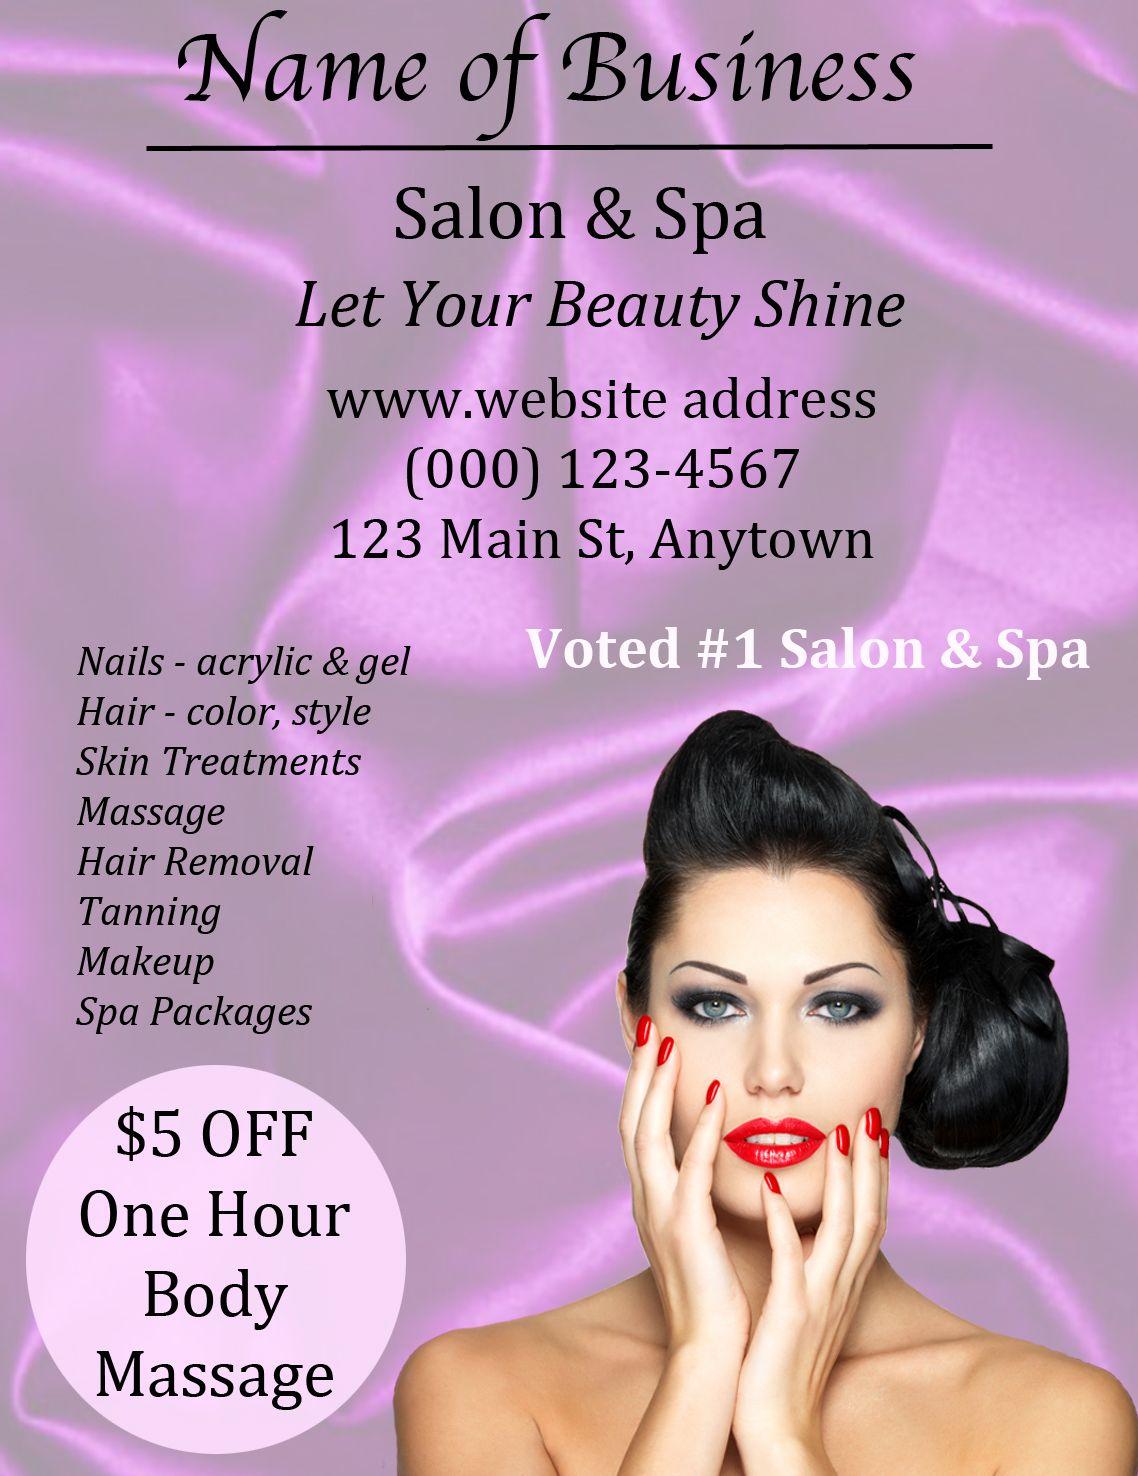 Hair Salon Ad 2 Tanned makeup, Skin treatments, Ads